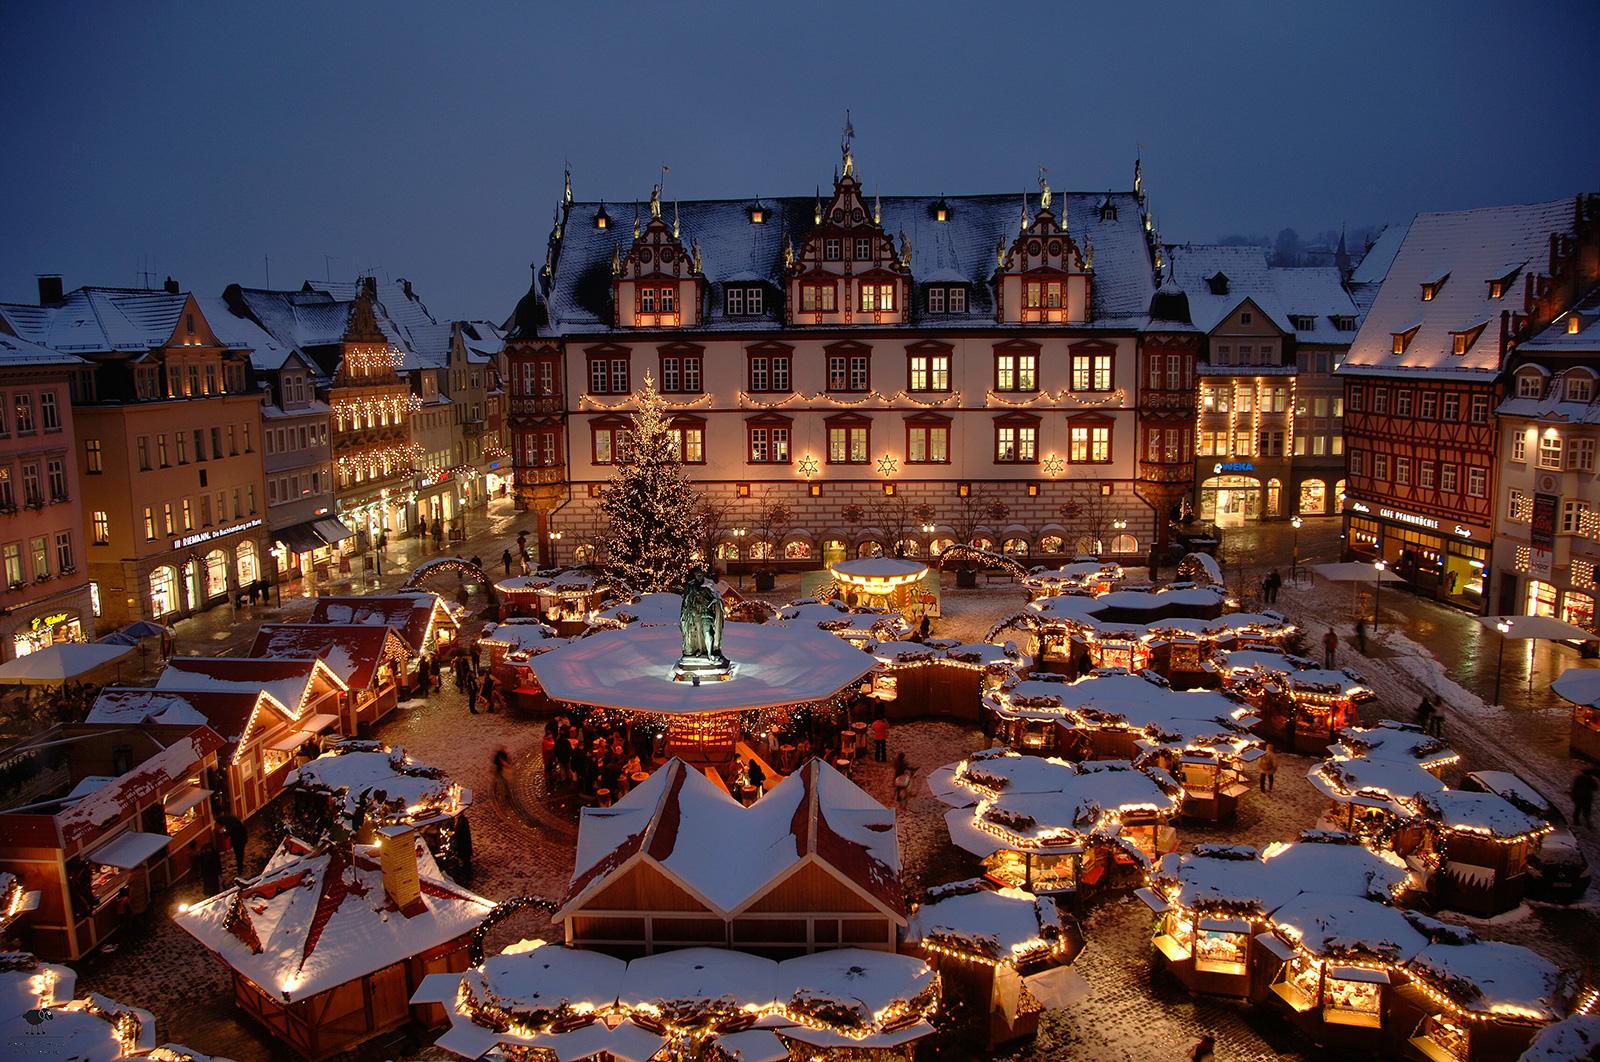 Bamberg Weihnachtsmarkt.The Best Christmas Markets In And Around Bamberg